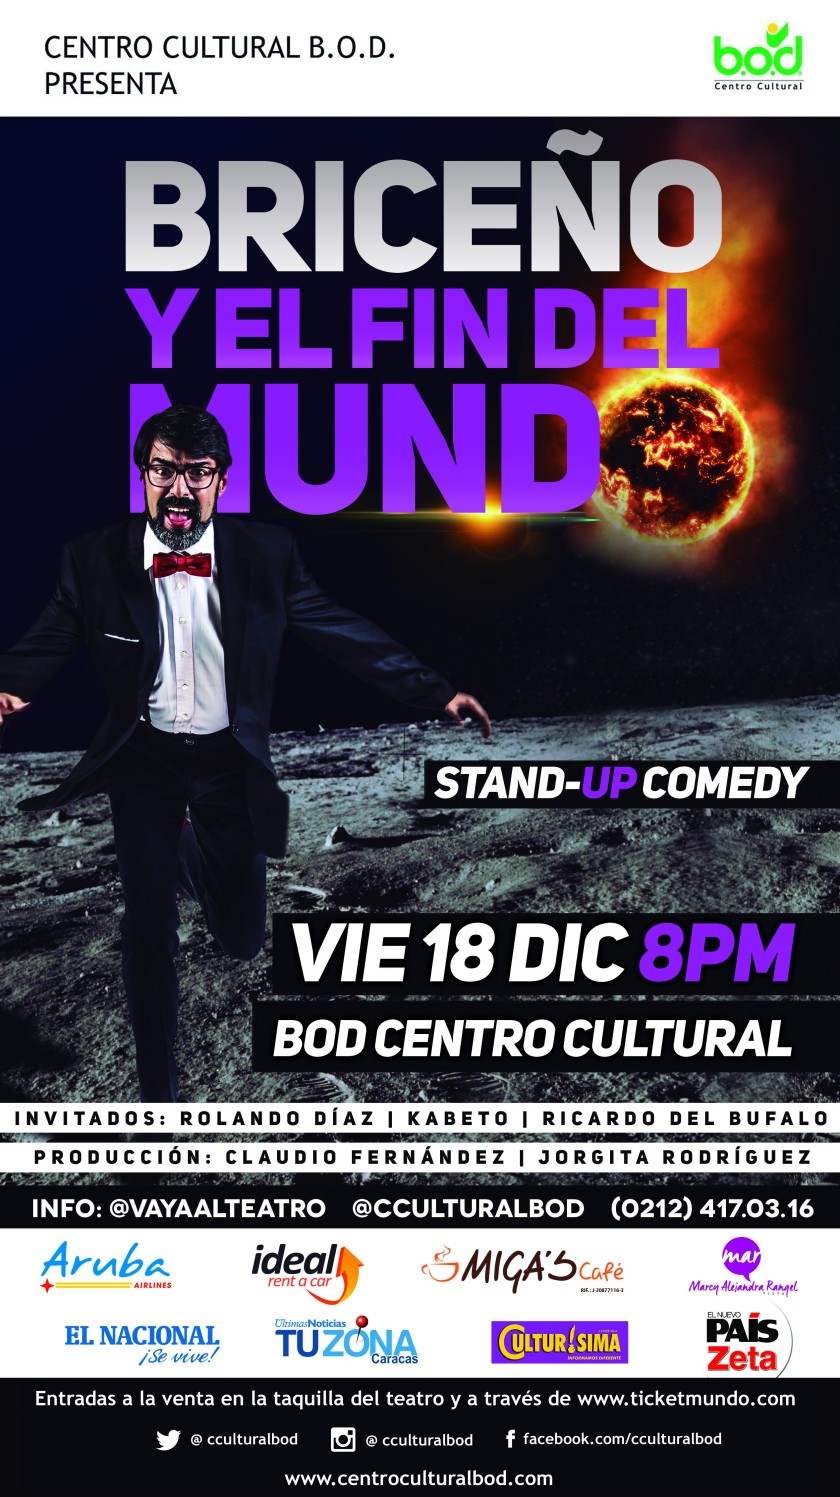 pendon teatro 02